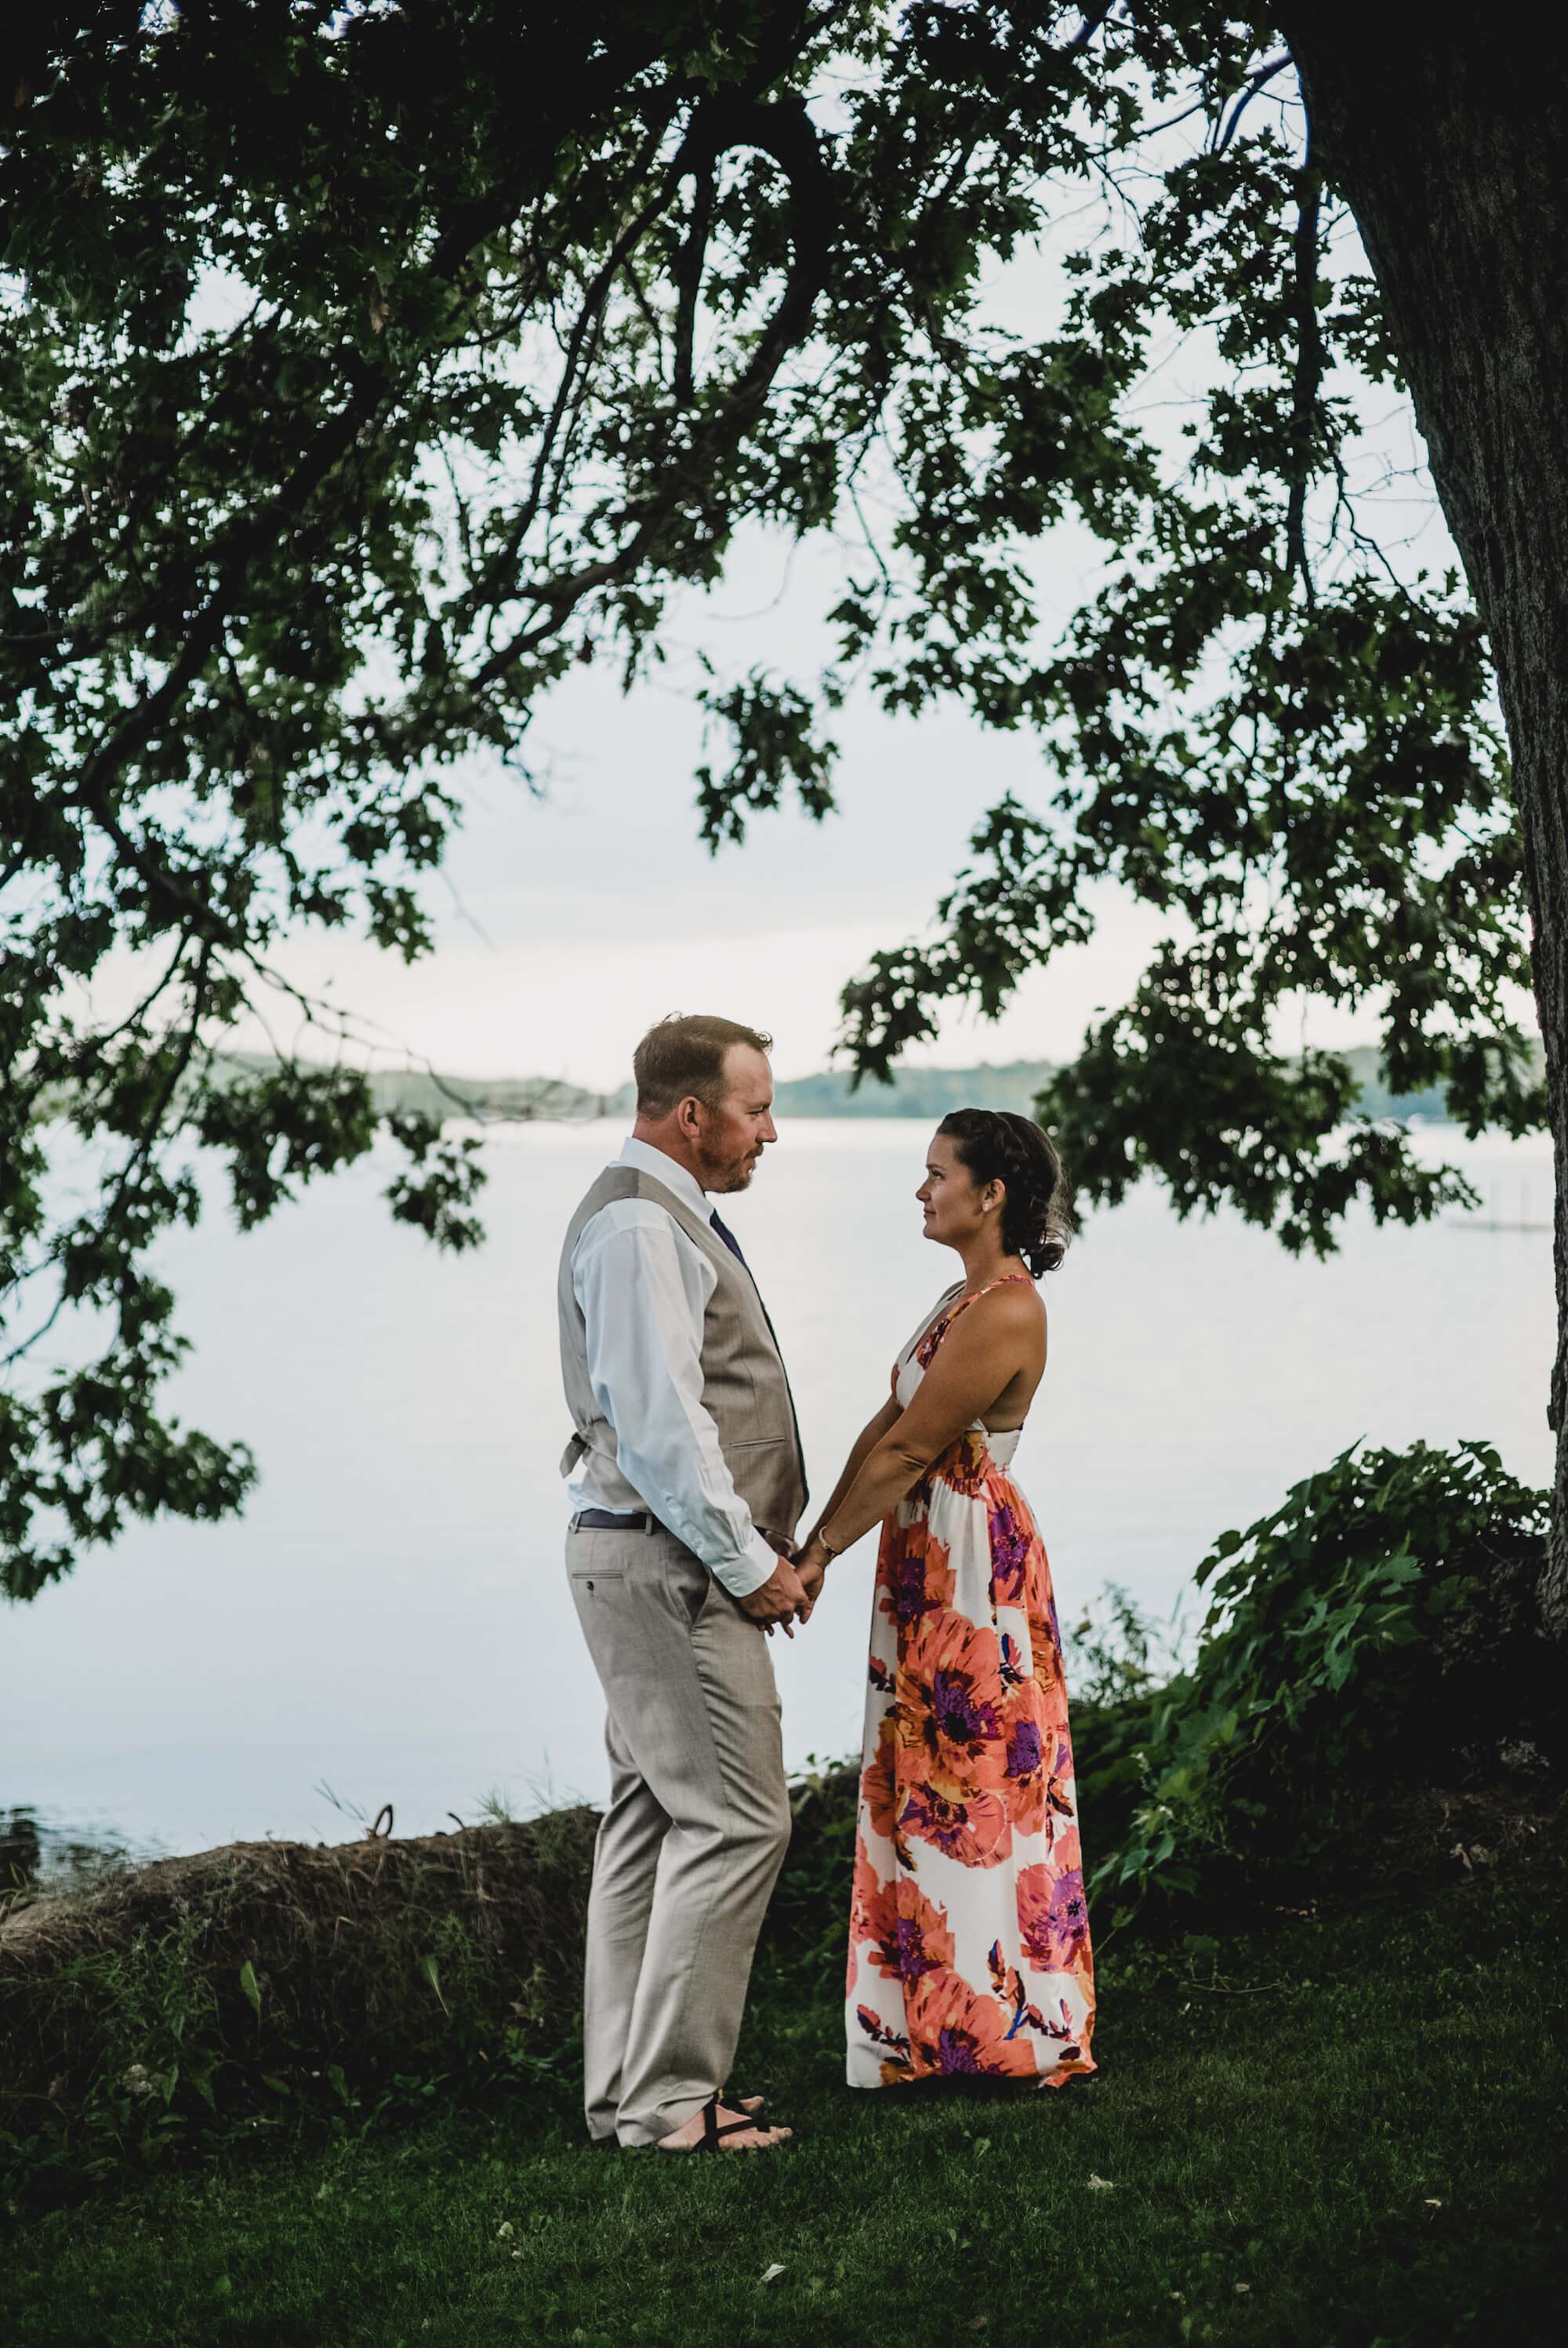 engle-olson-maddy-pat-mn-wedding-photography-37.jpg